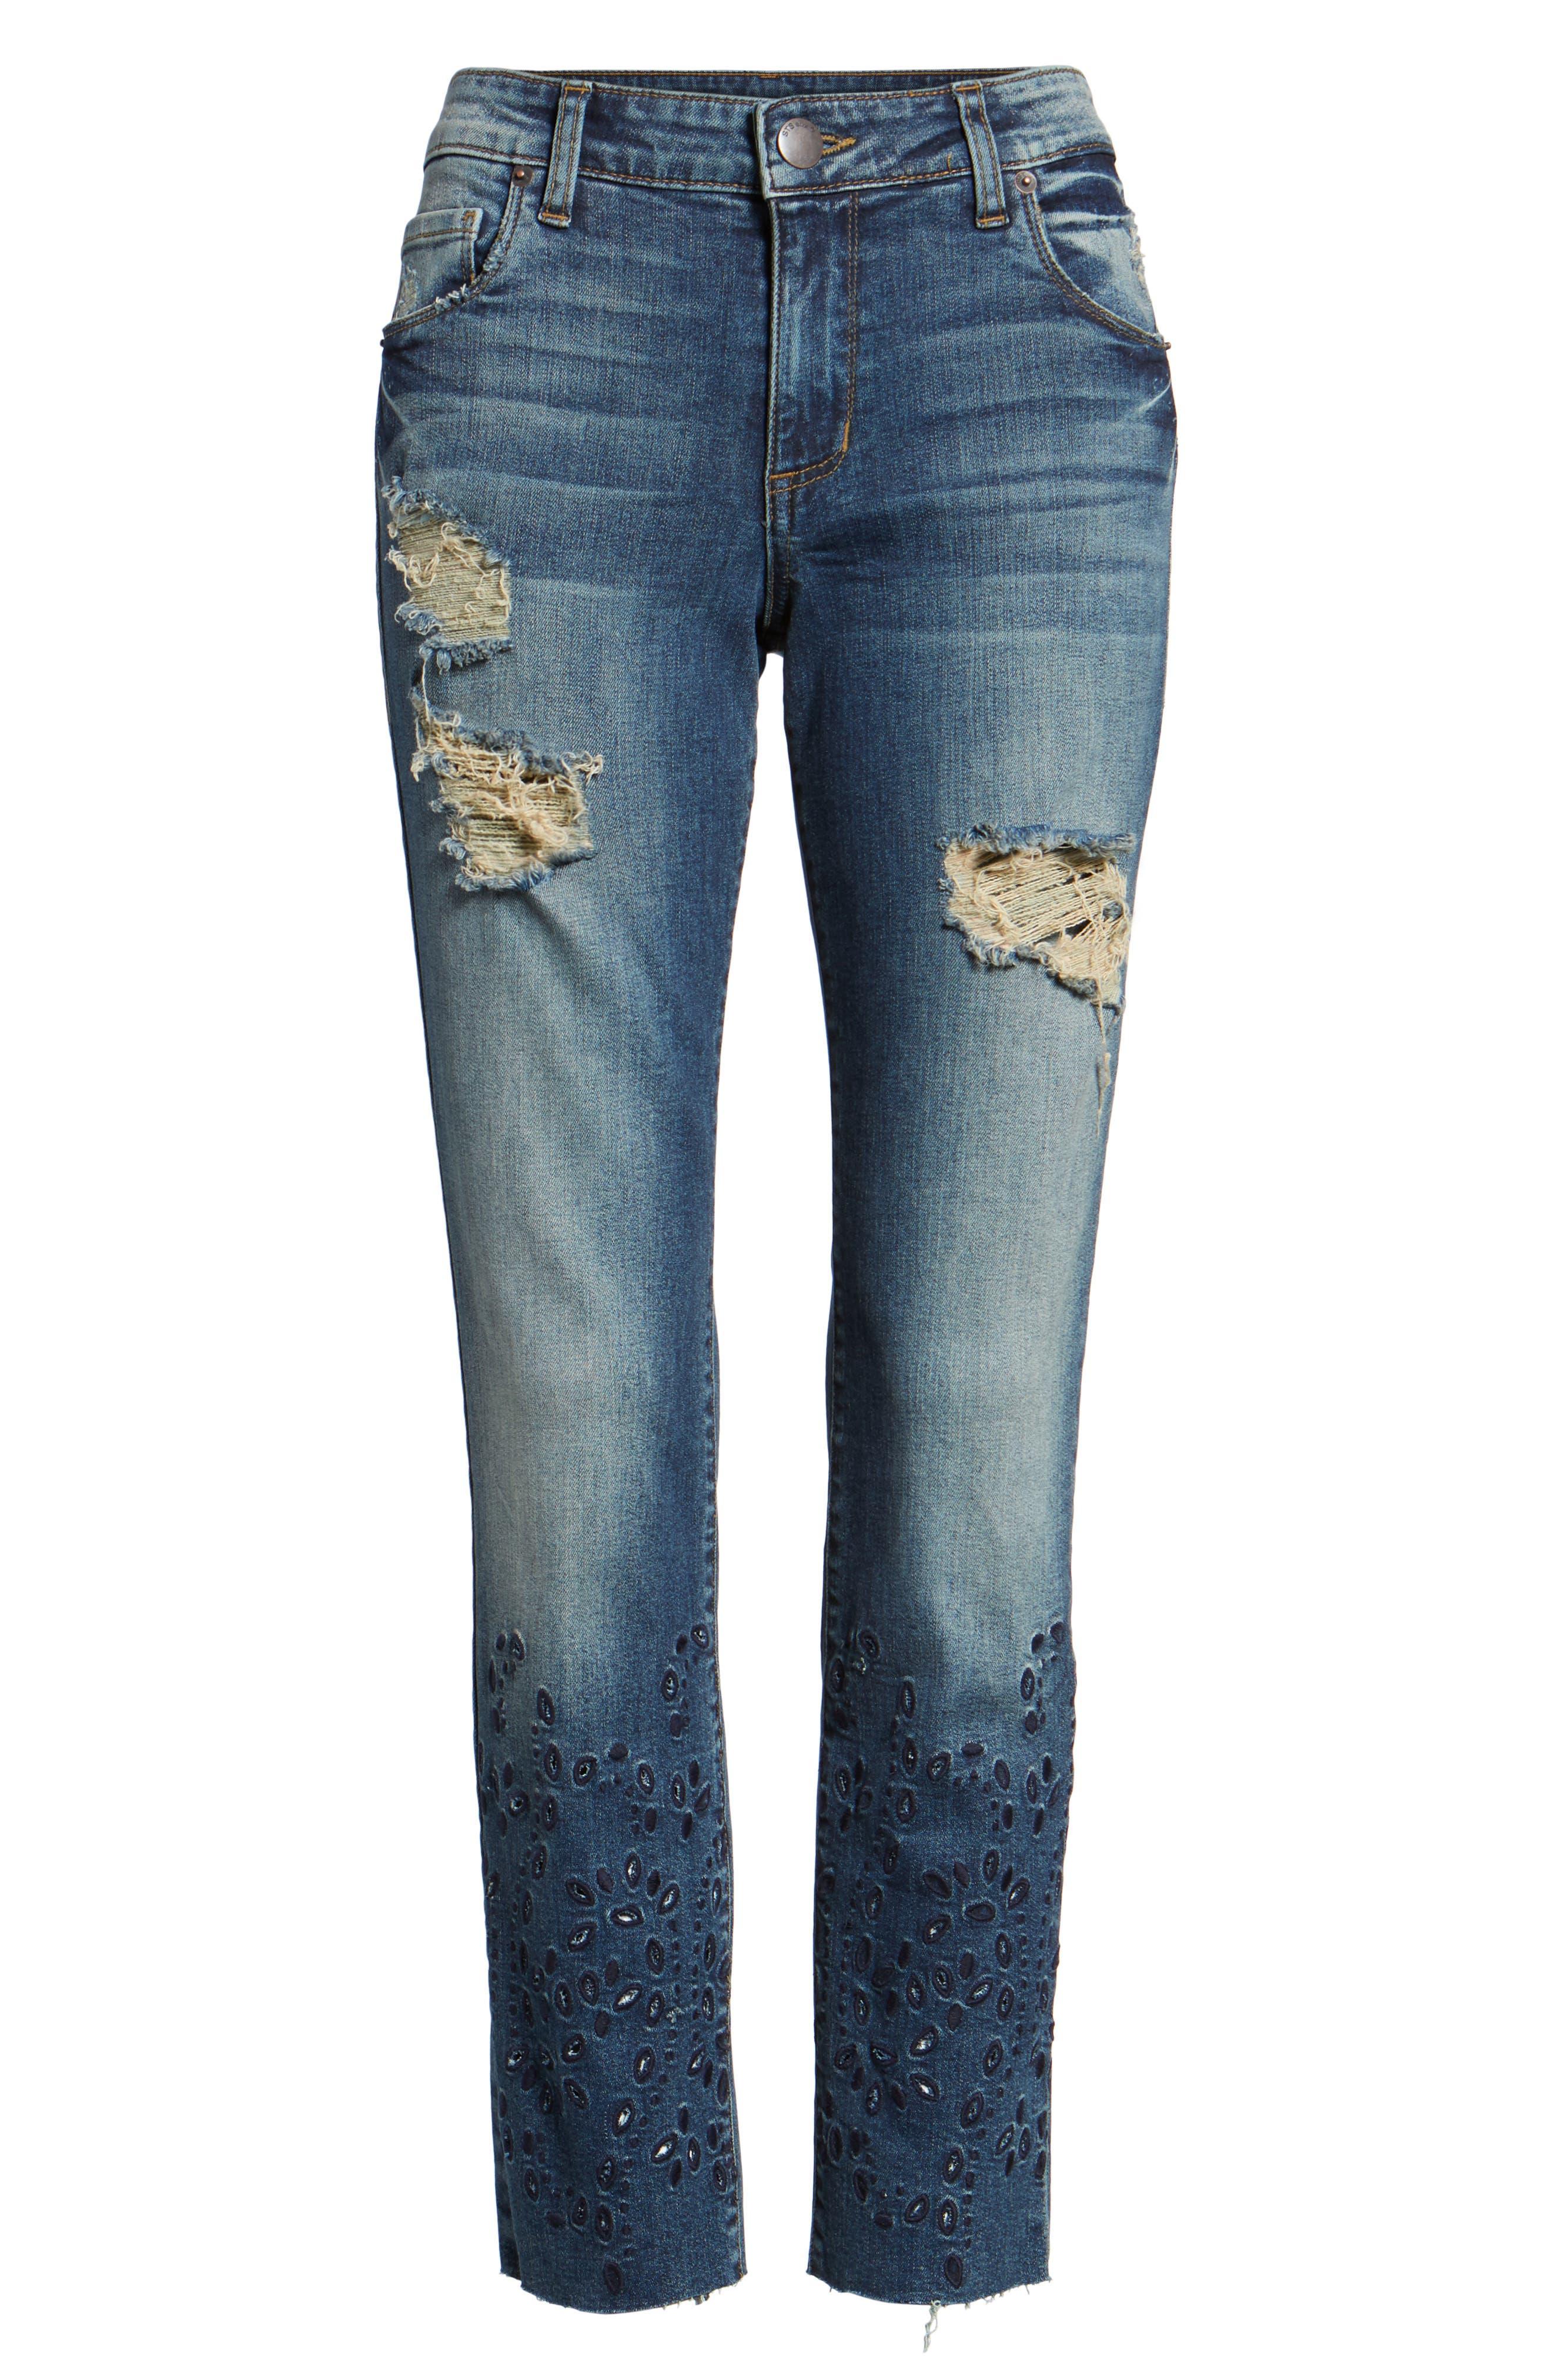 Taylor Ripped Eyelet Straight Leg Jeans,                             Alternate thumbnail 6, color,                             400